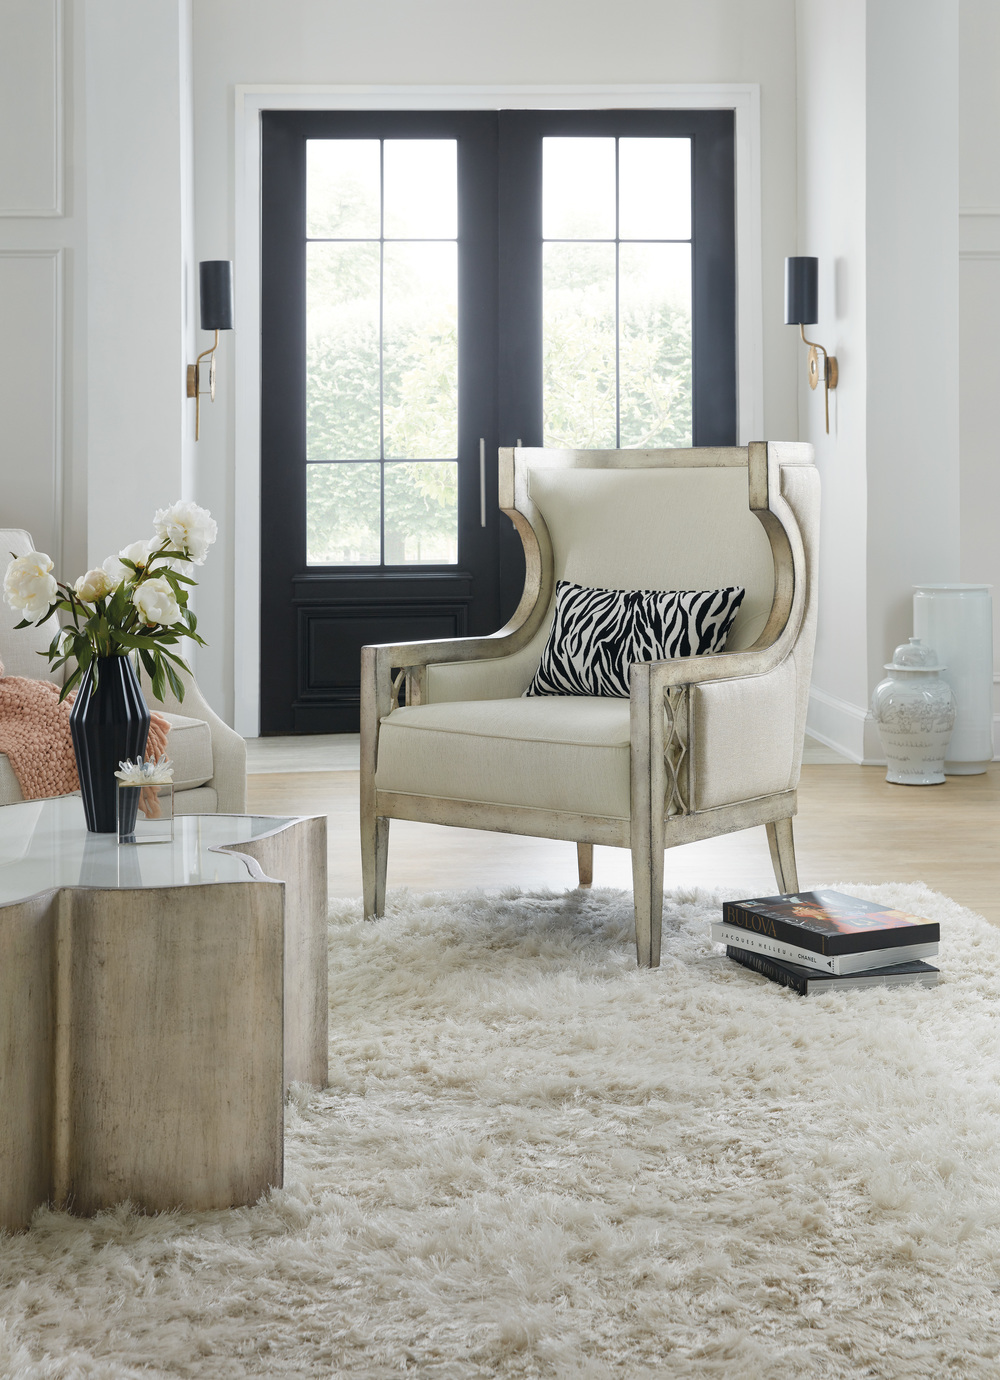 Hooker Furniture - Debutant Wing Chair